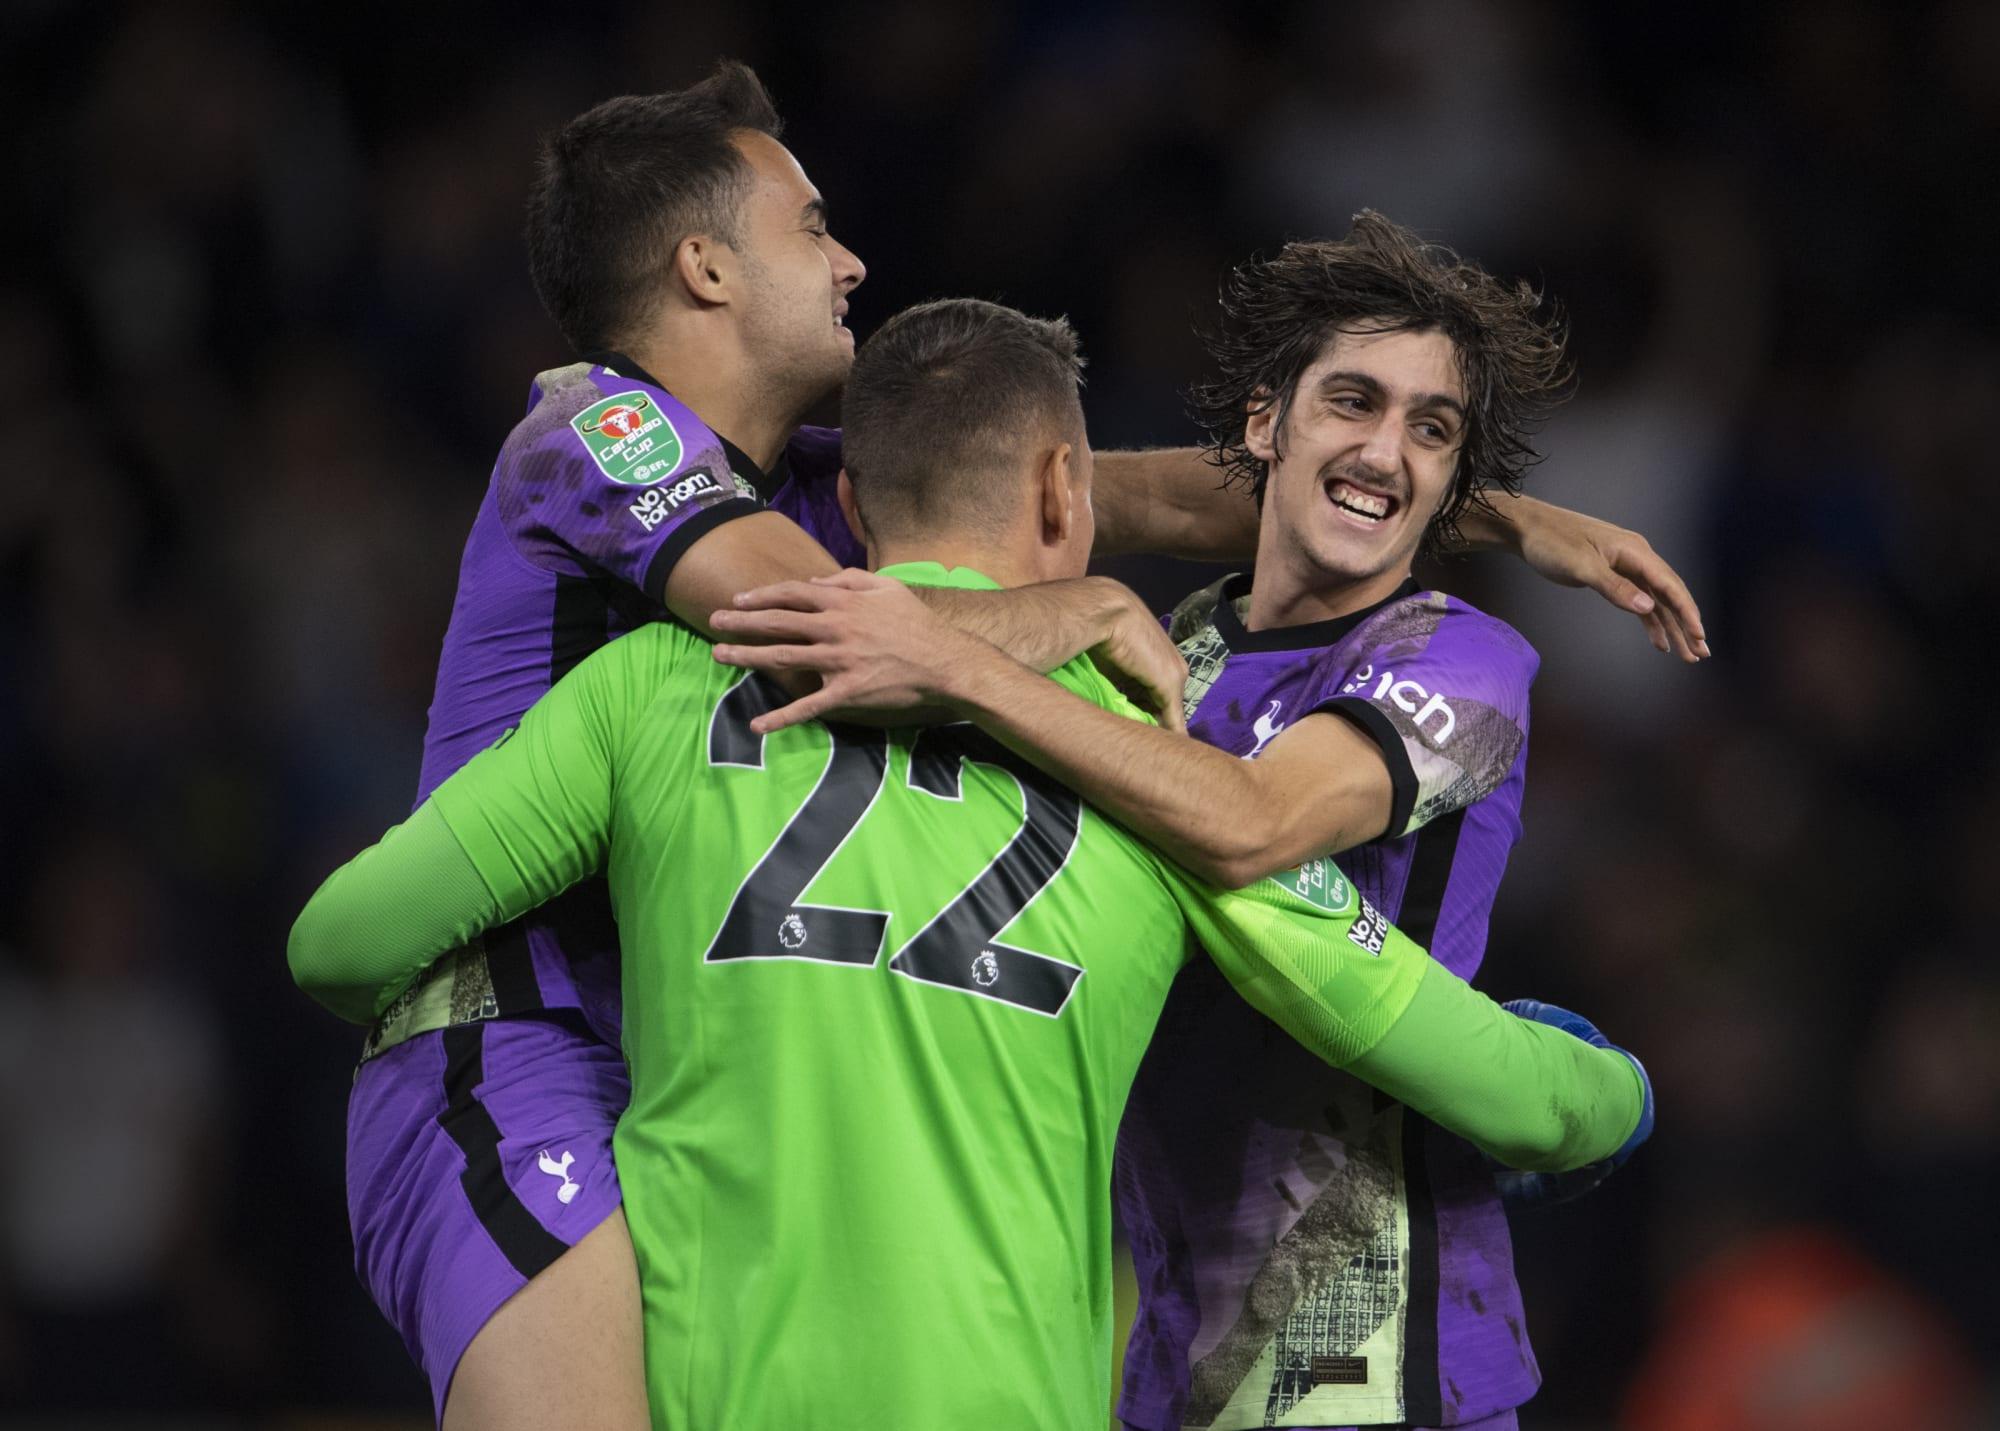 Tottenham: Summer signings impress in win over Wolves